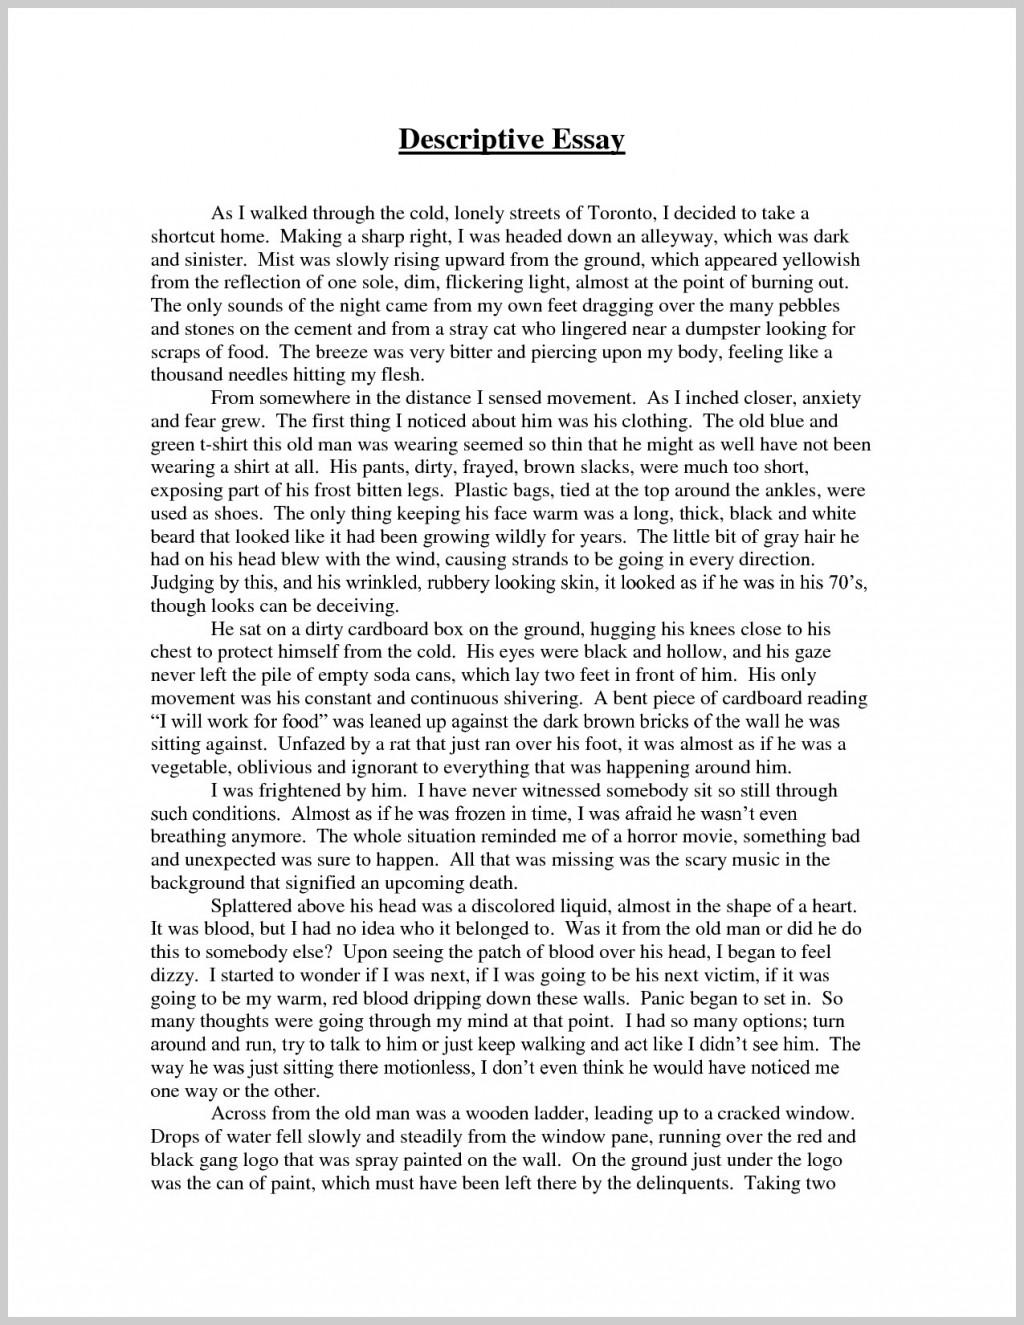 012 Narrative Descriptive Essay Introduction Of Essays Impressive Pdf About Earthquake Outline Large